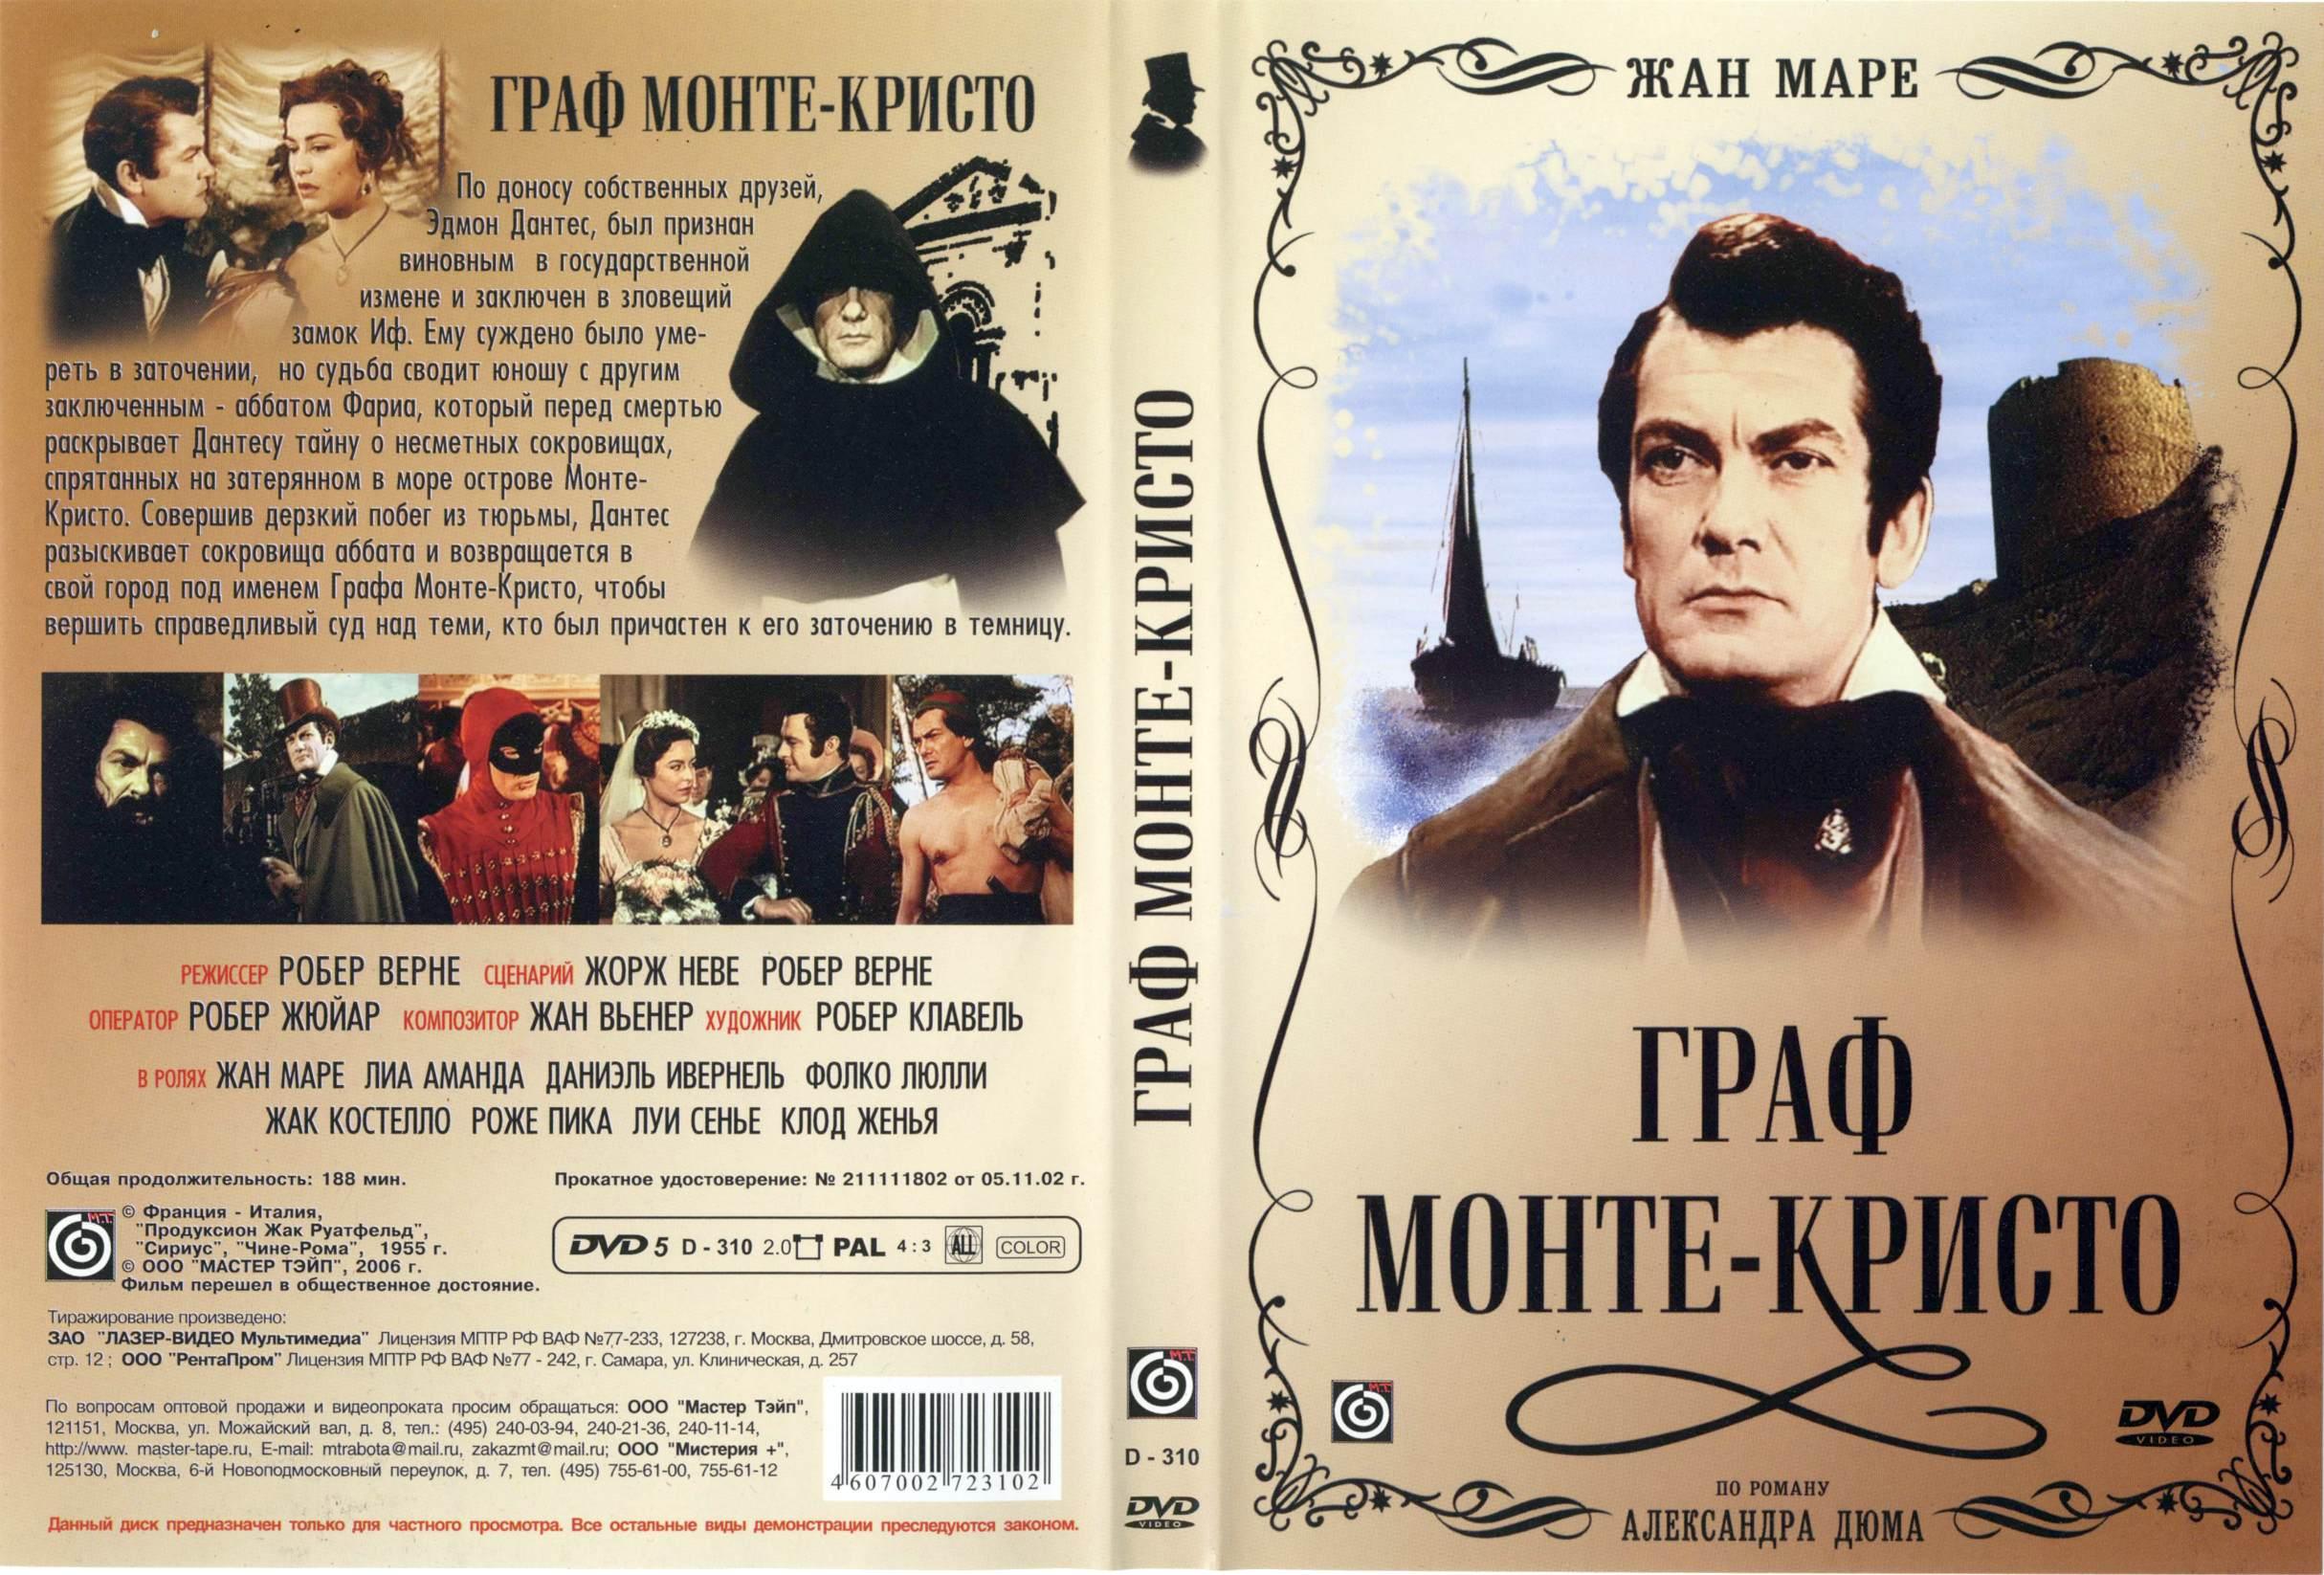 обложка фильма граф монте кристо